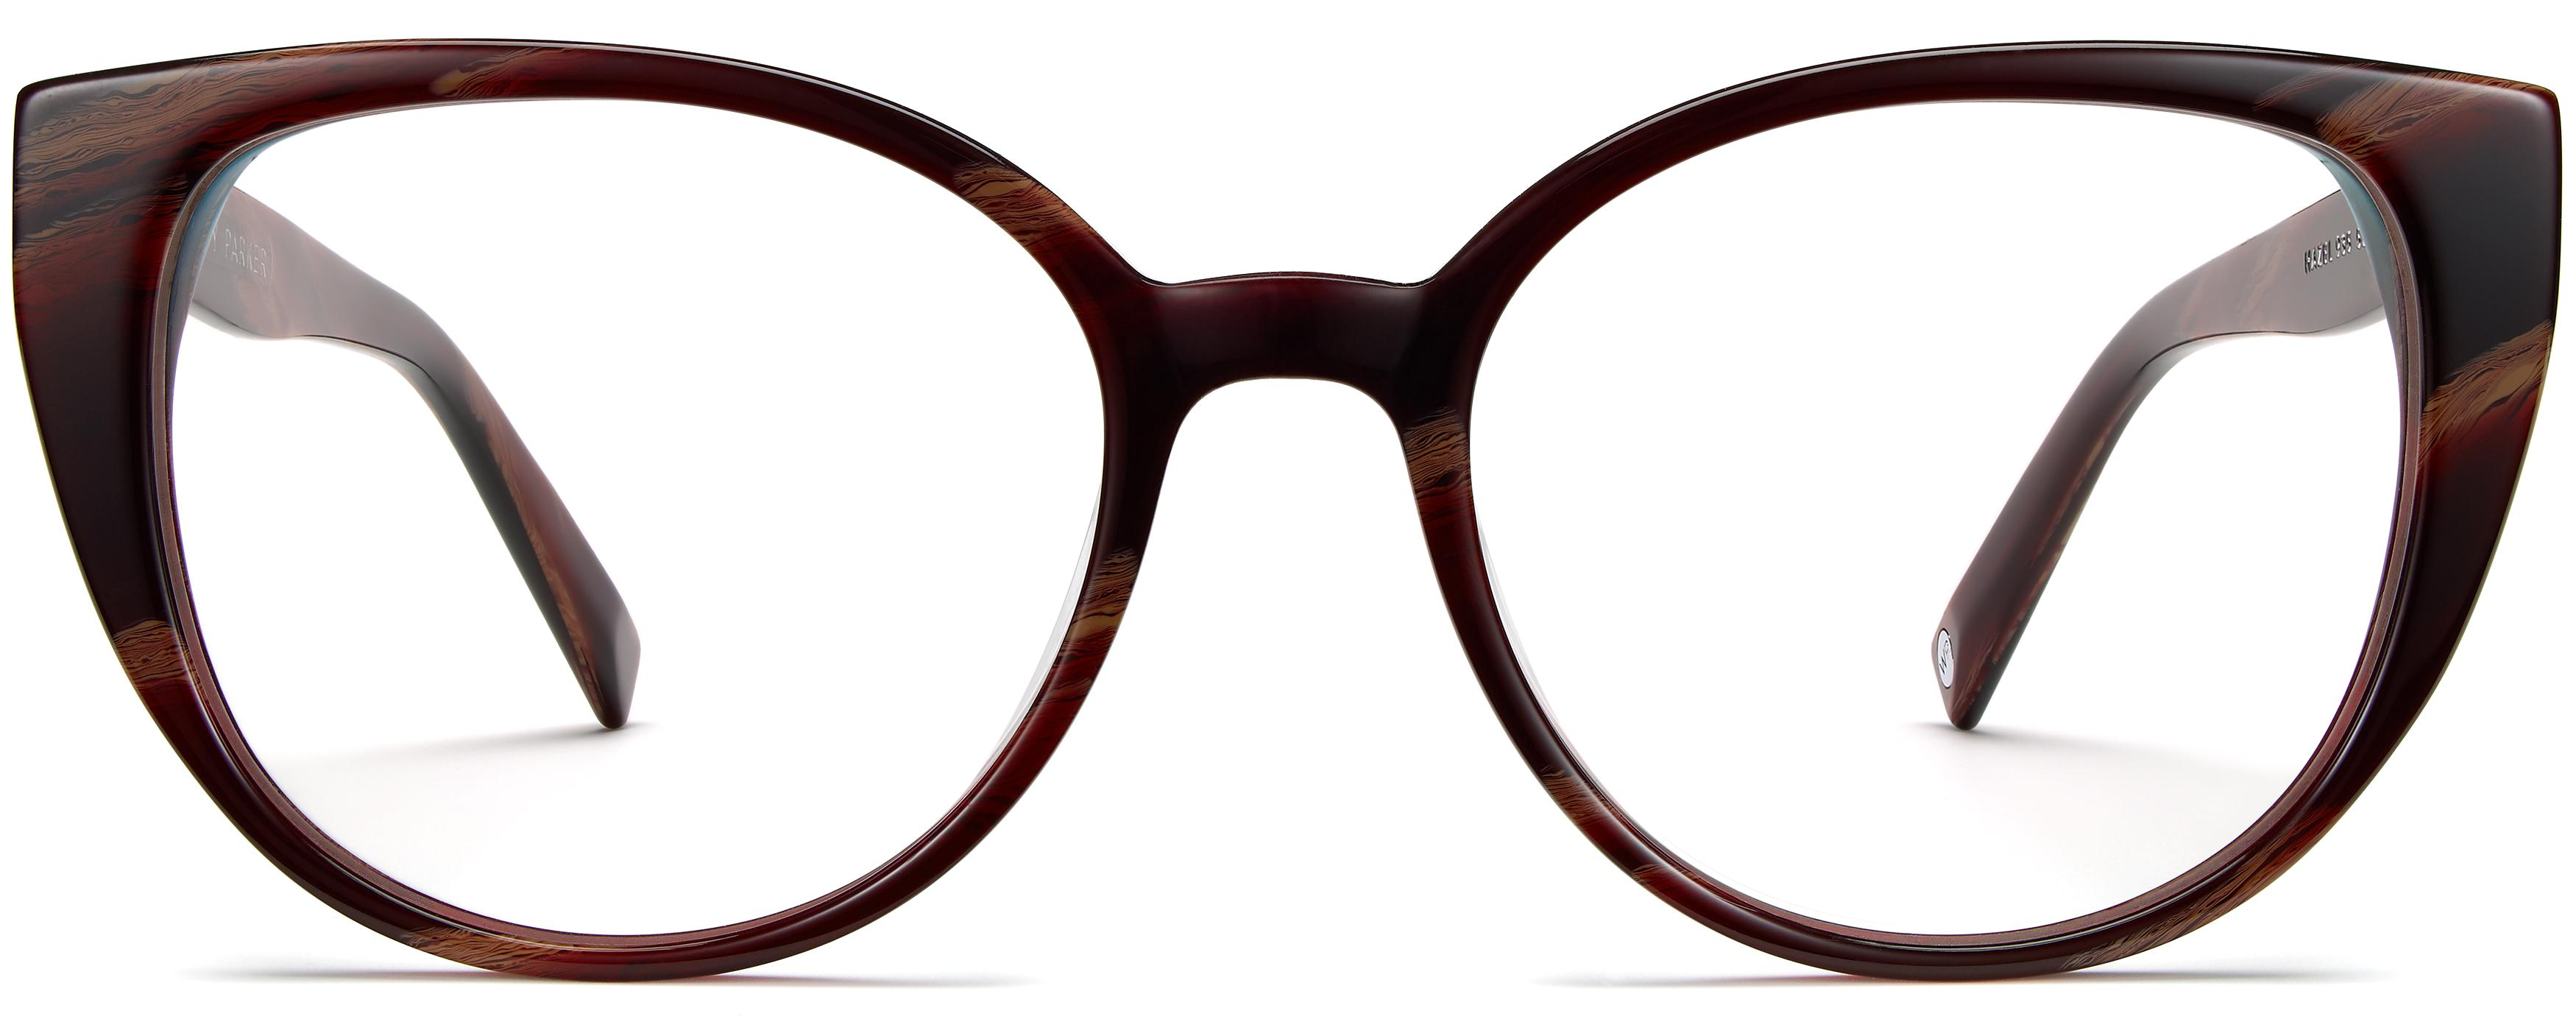 395c909ce Women's Eyeglasses | Warby Parker